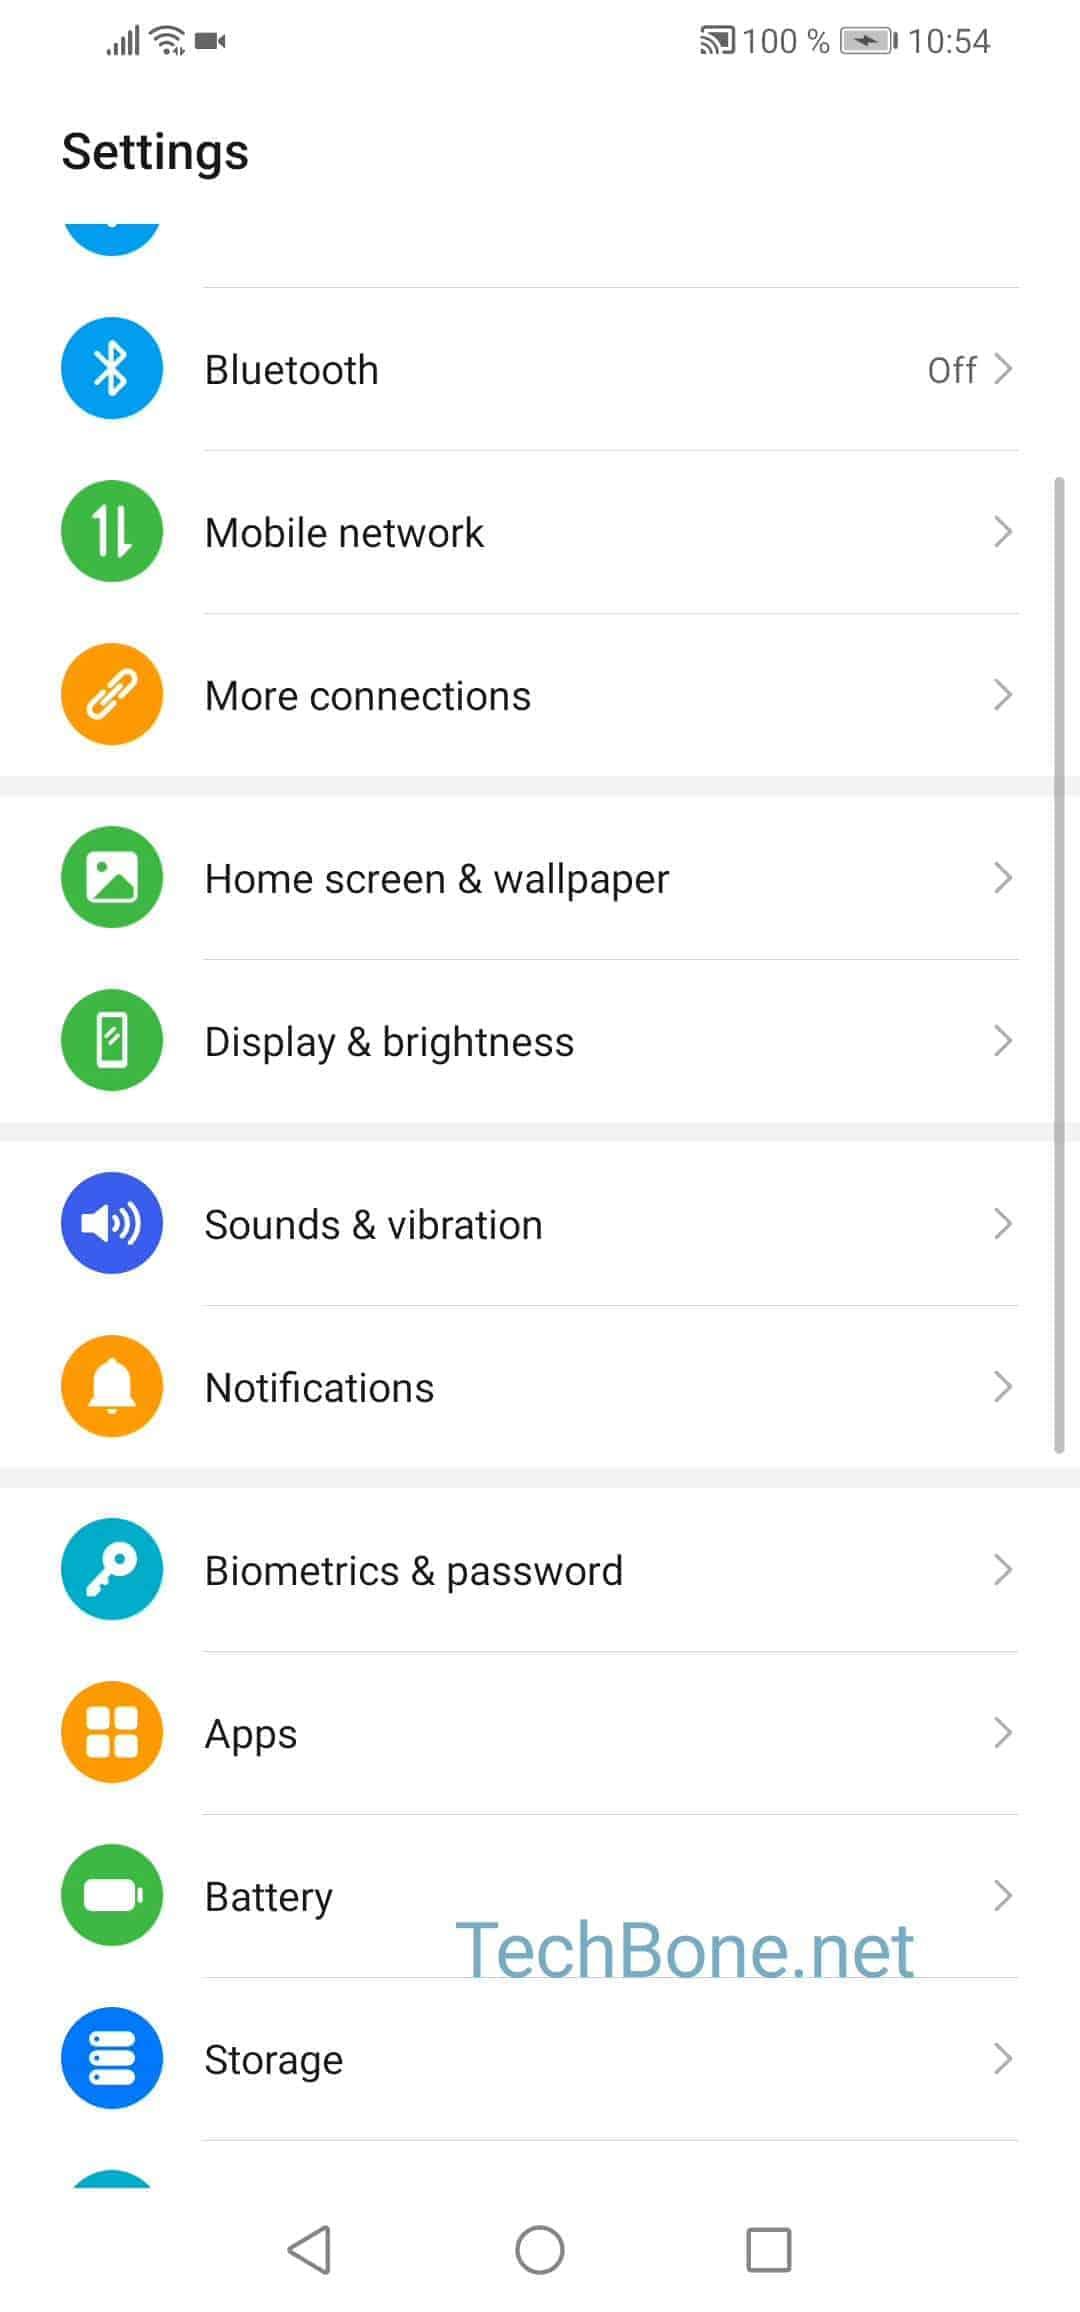 Step 2: Tap on Biometric & password